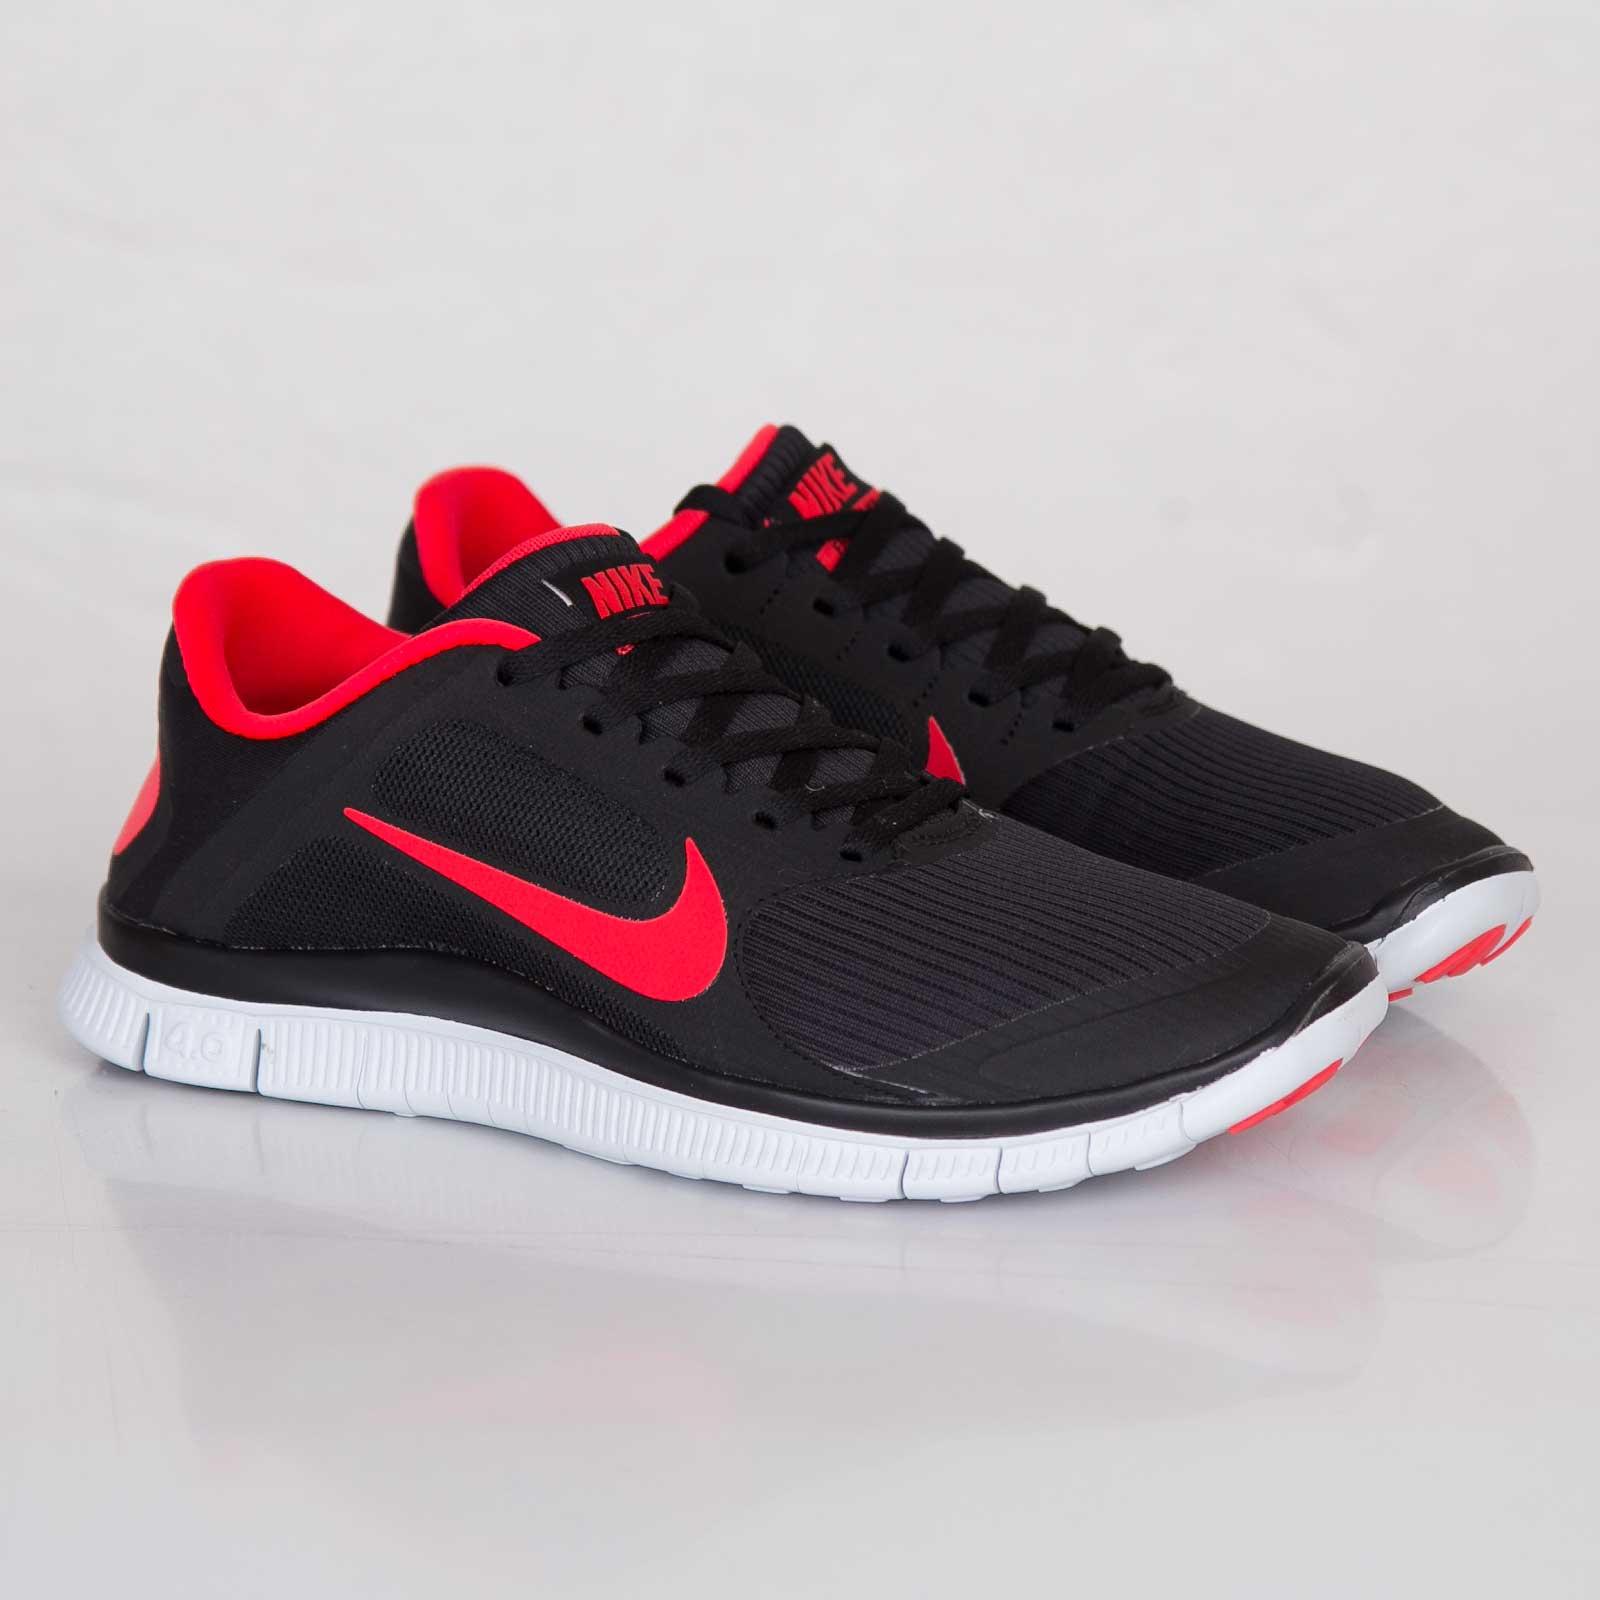 Nike Free 4.0 V3